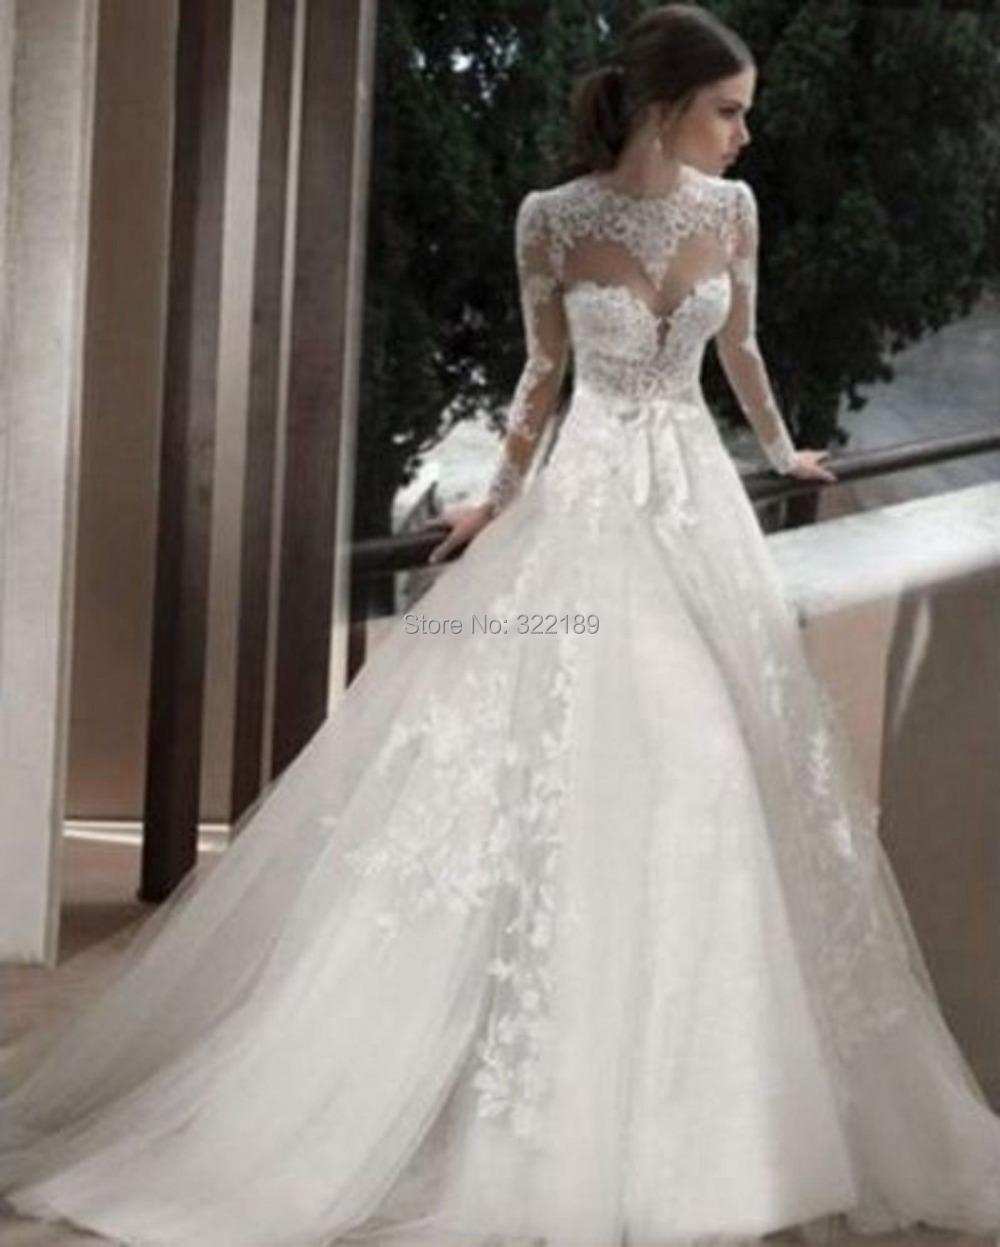 dress for a beach wedding white beach wedding dresses stunning beach wedding dresses ideas